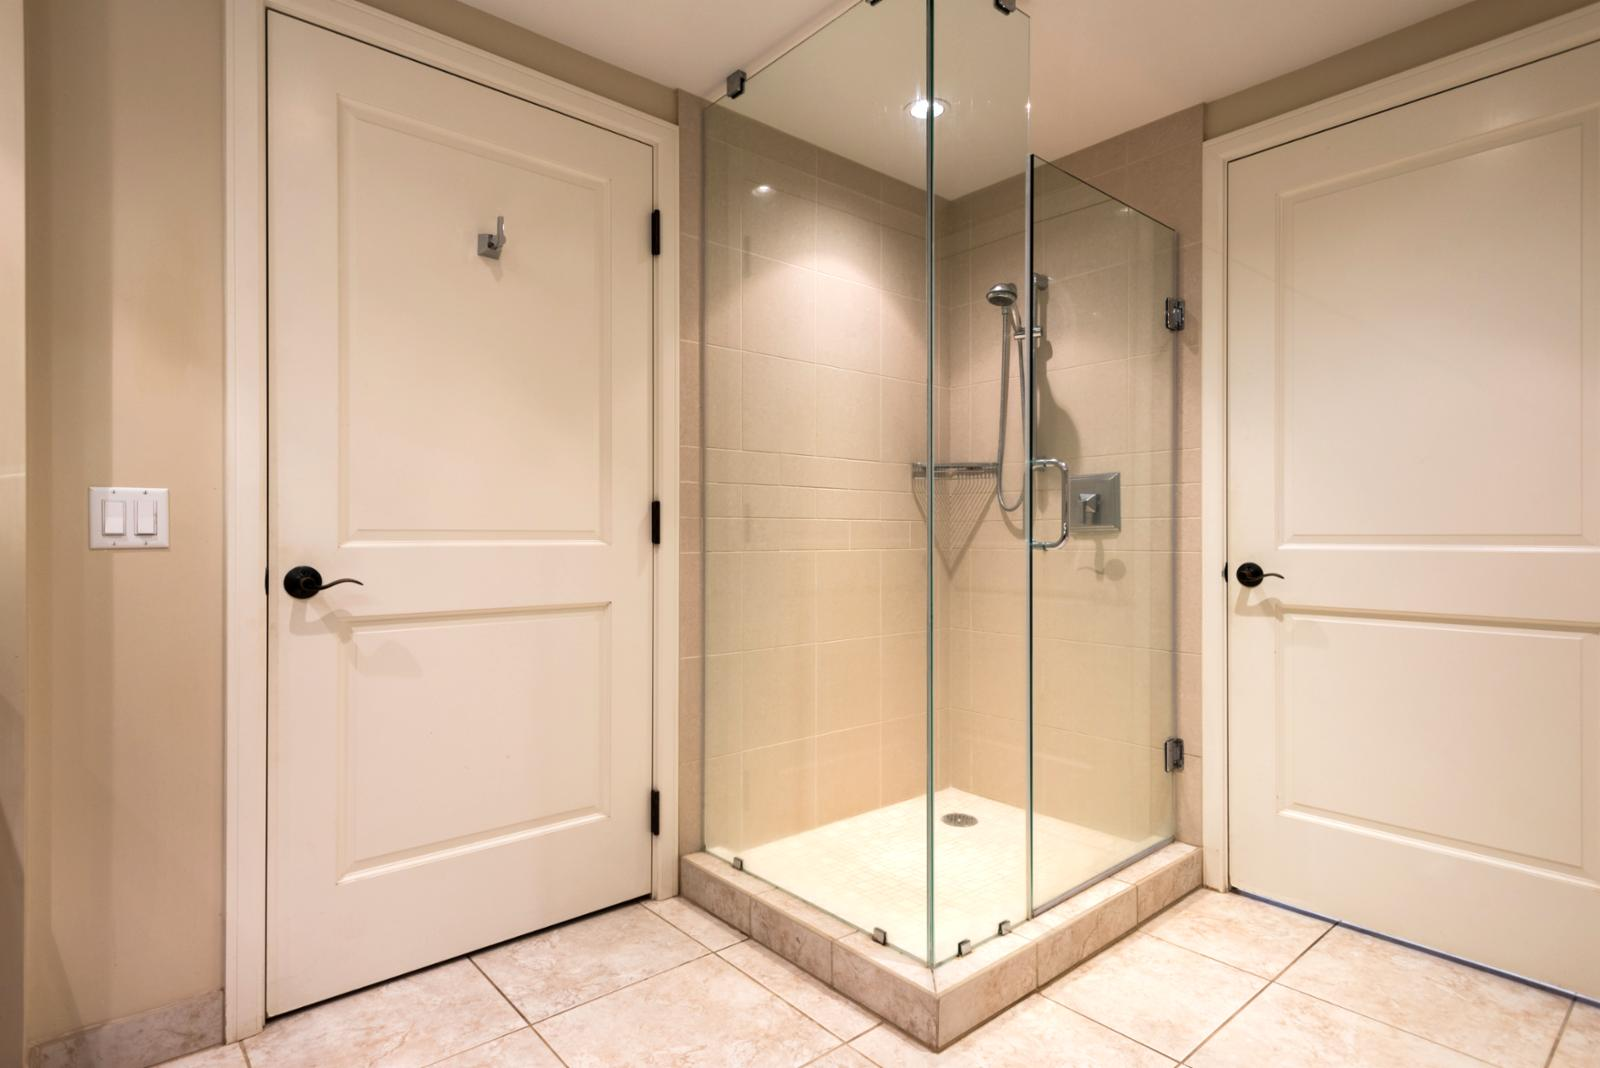 Floor to ceiling glass enclosed shower fine tile details